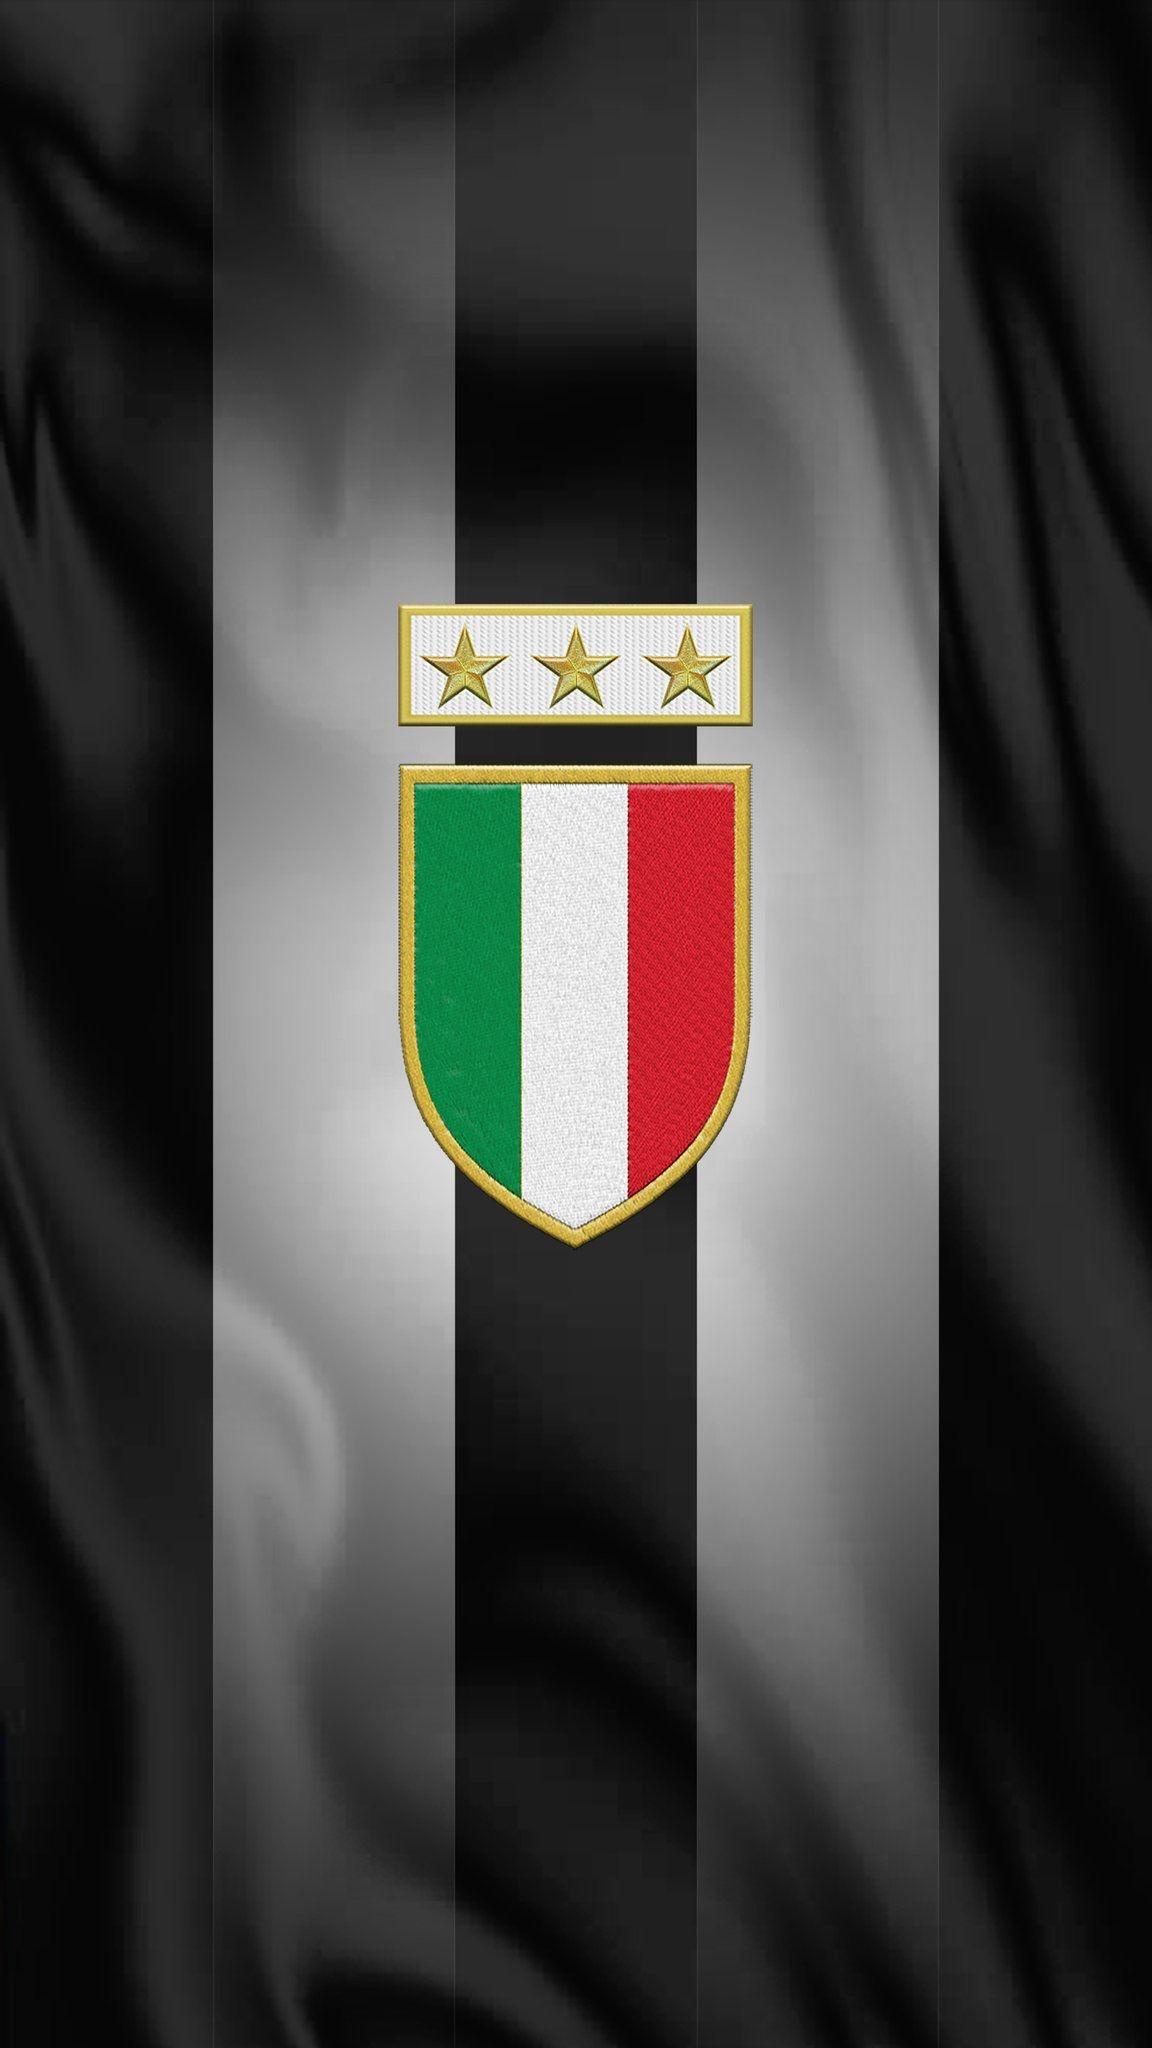 Scudetto Juve ποδόσφαιρο Juventus Soccer Football Wallpaper